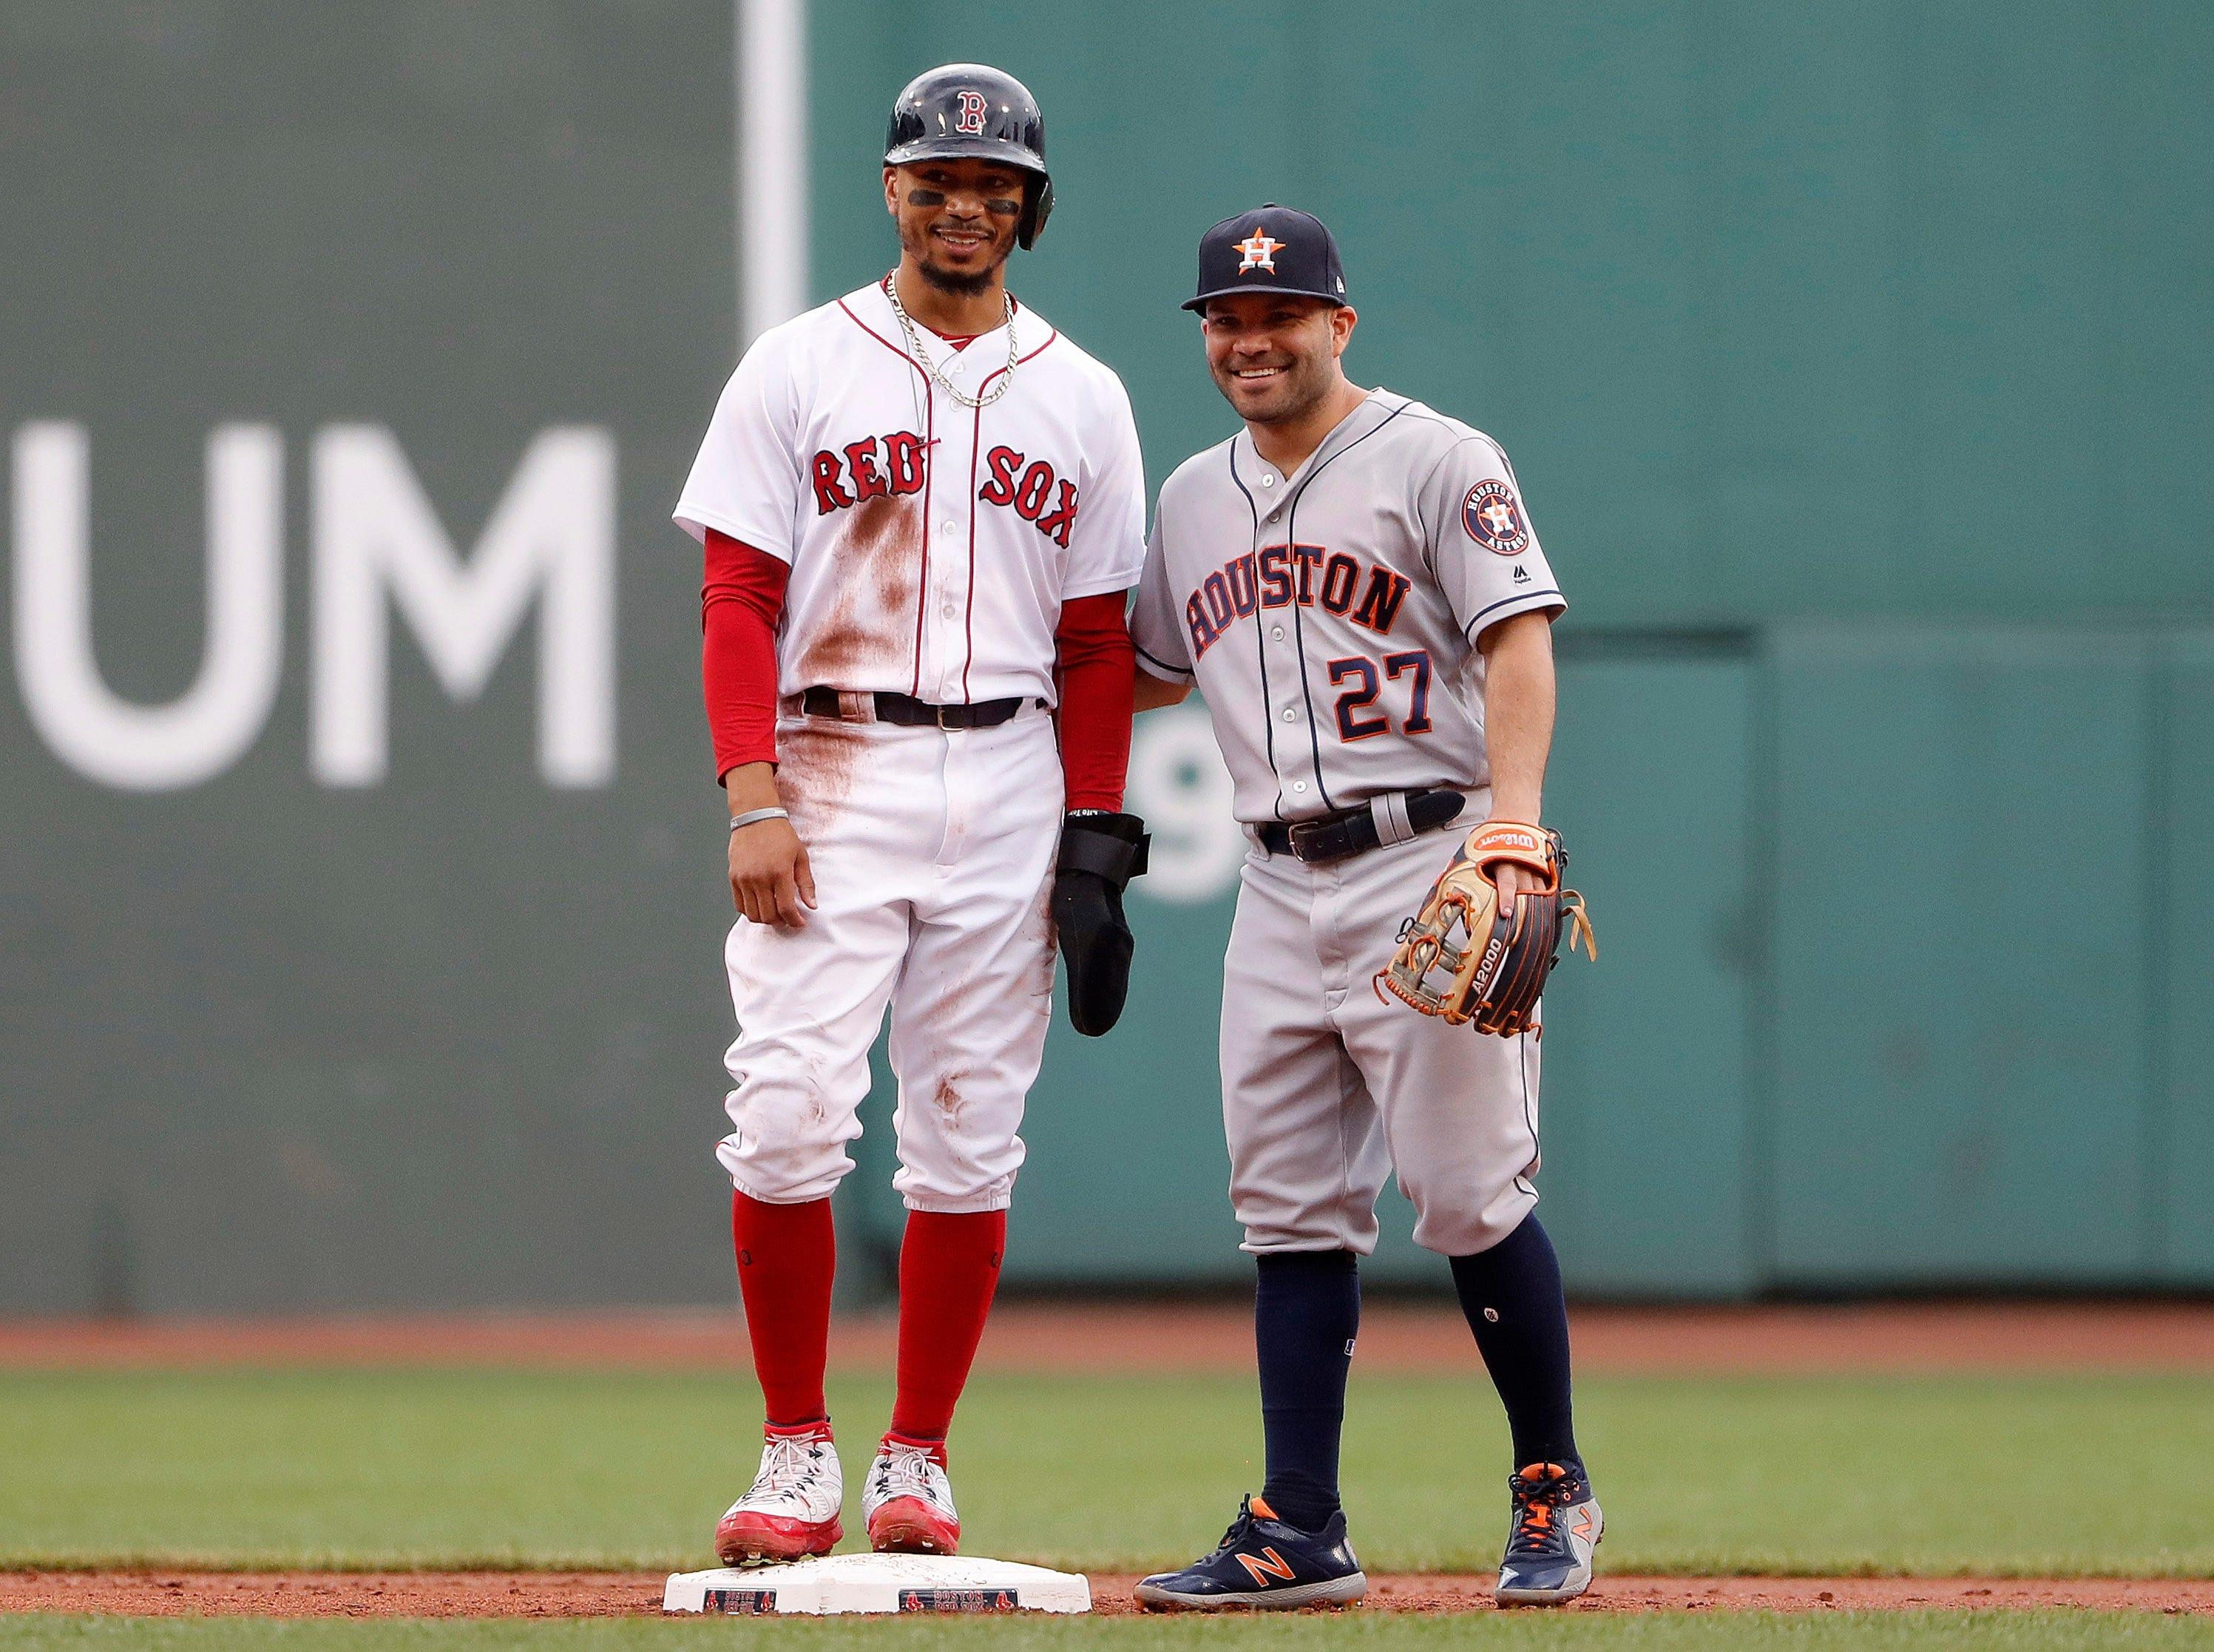 MLB power rankings: American League teams dominated the 2018 season